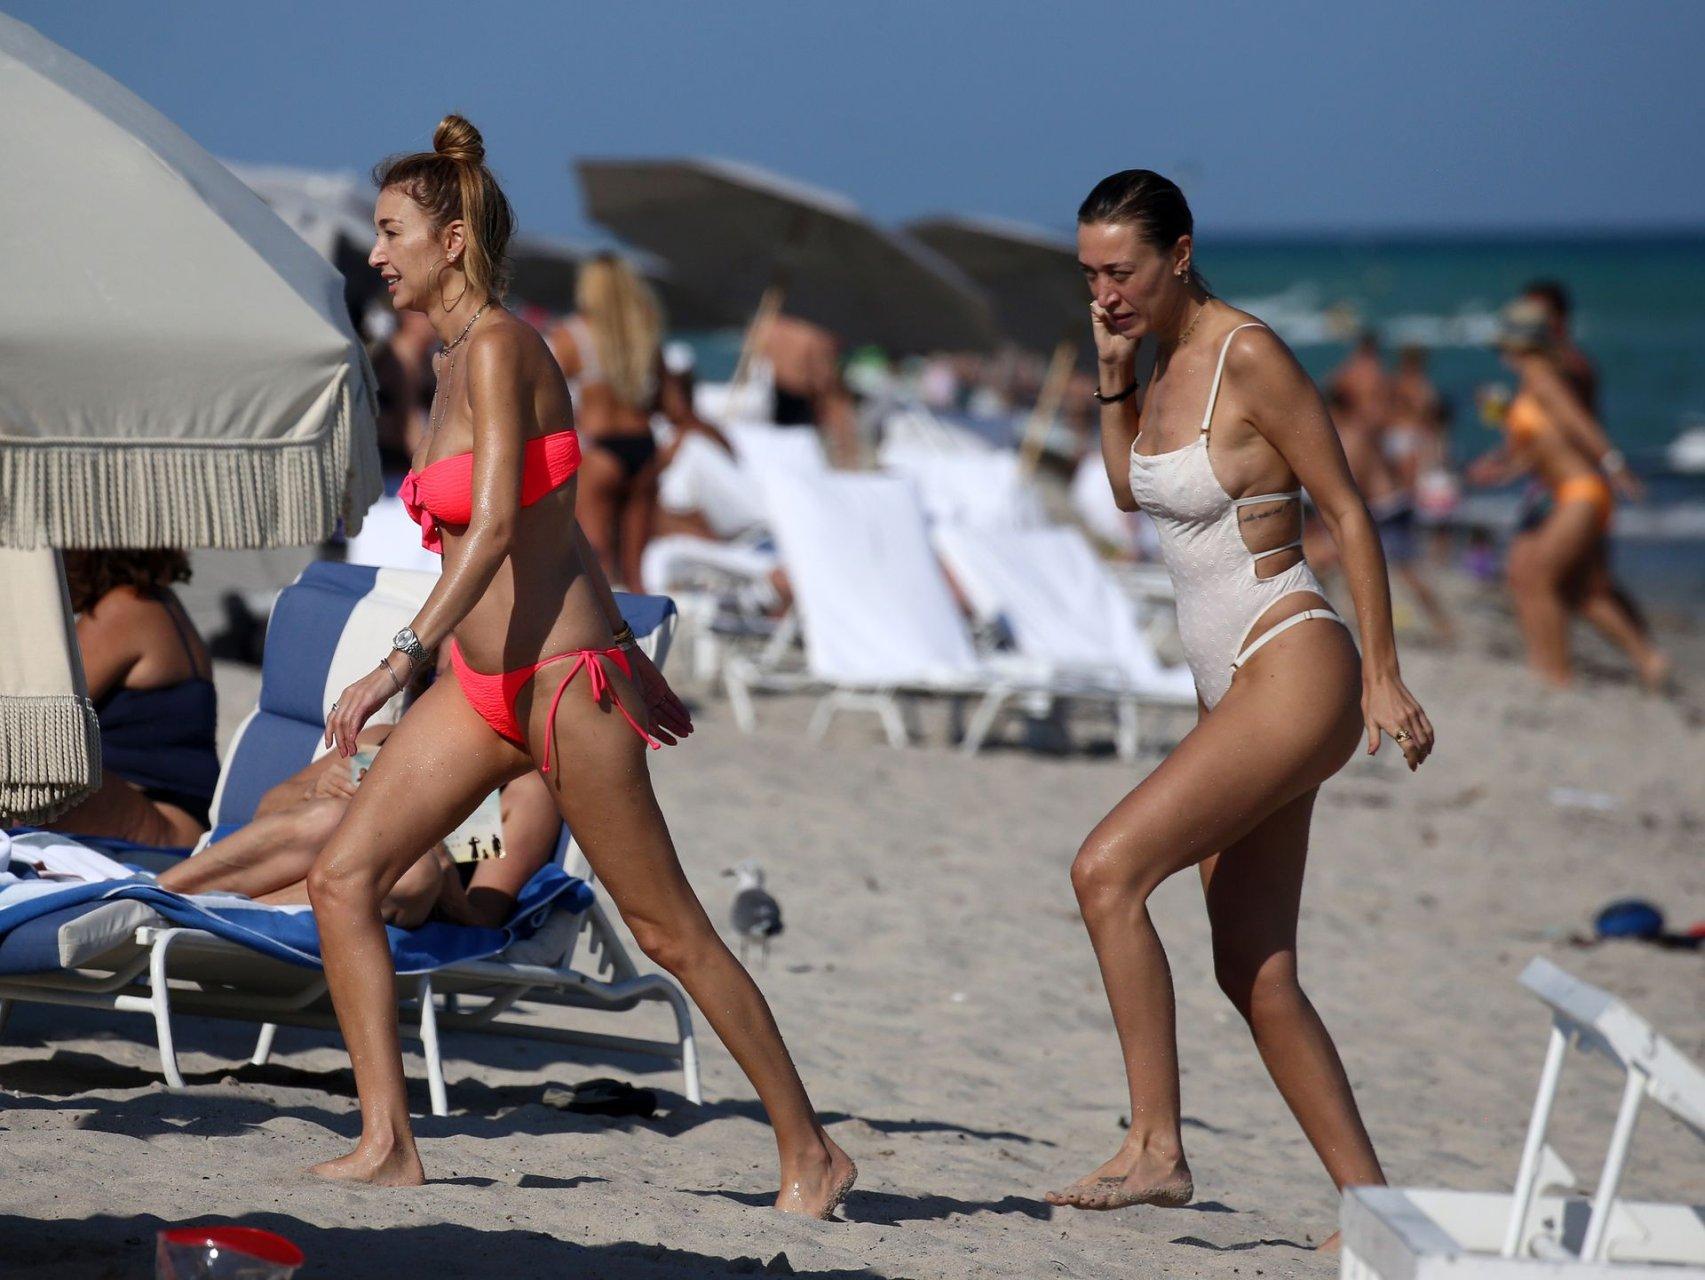 Porno Marielle Hadid nude (56 foto and video), Tits, Bikini, Feet, swimsuit 2020